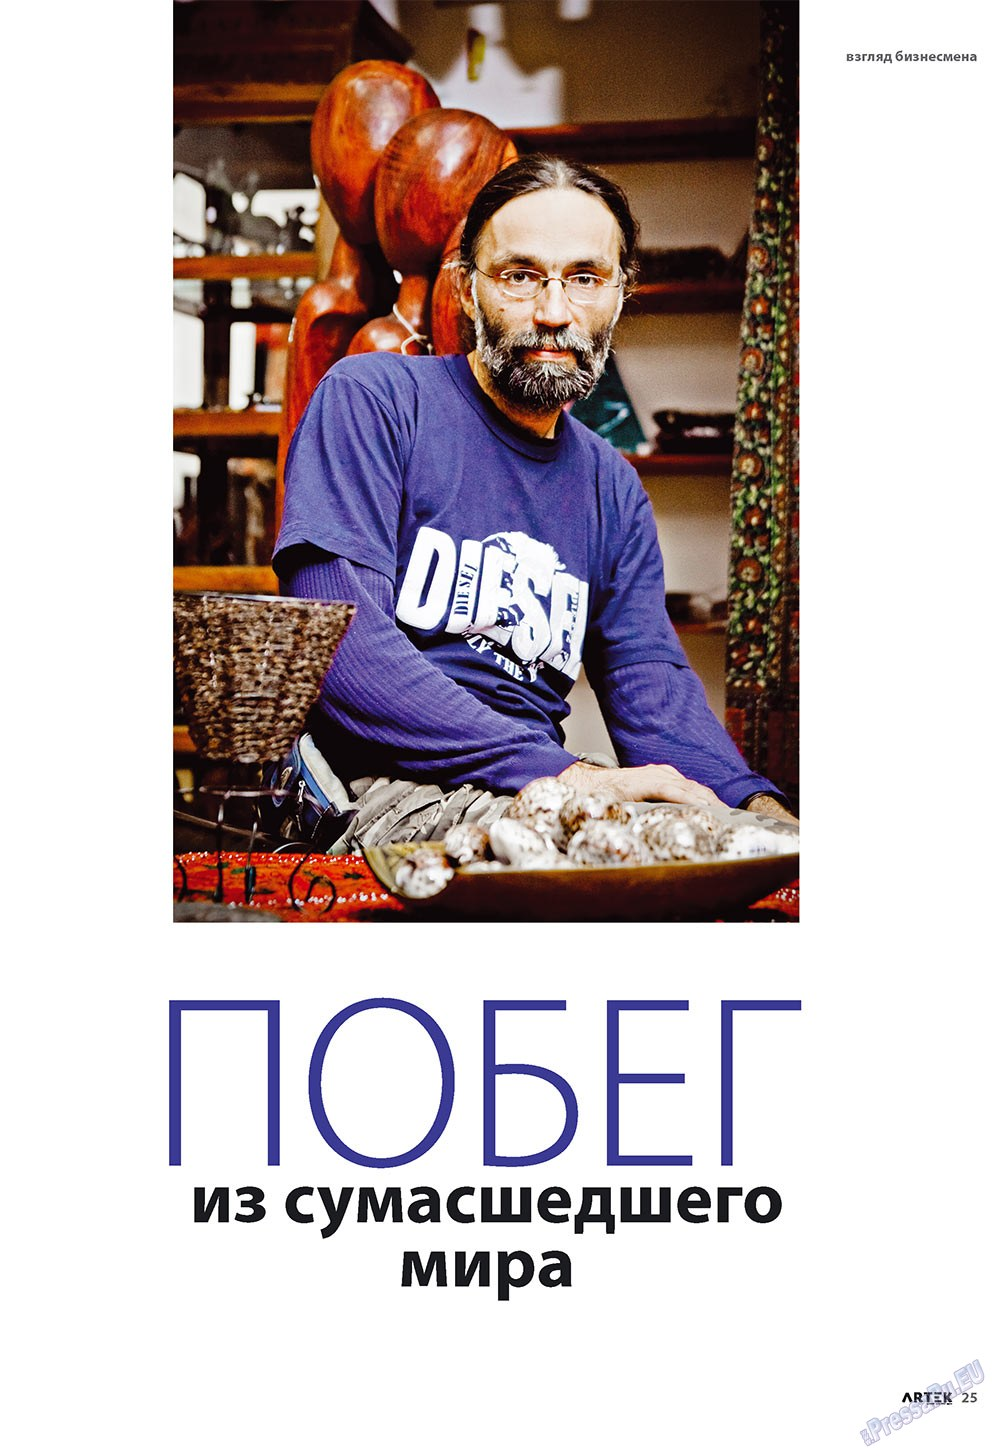 Артек (журнал). 2009 год, номер 5, стр. 25